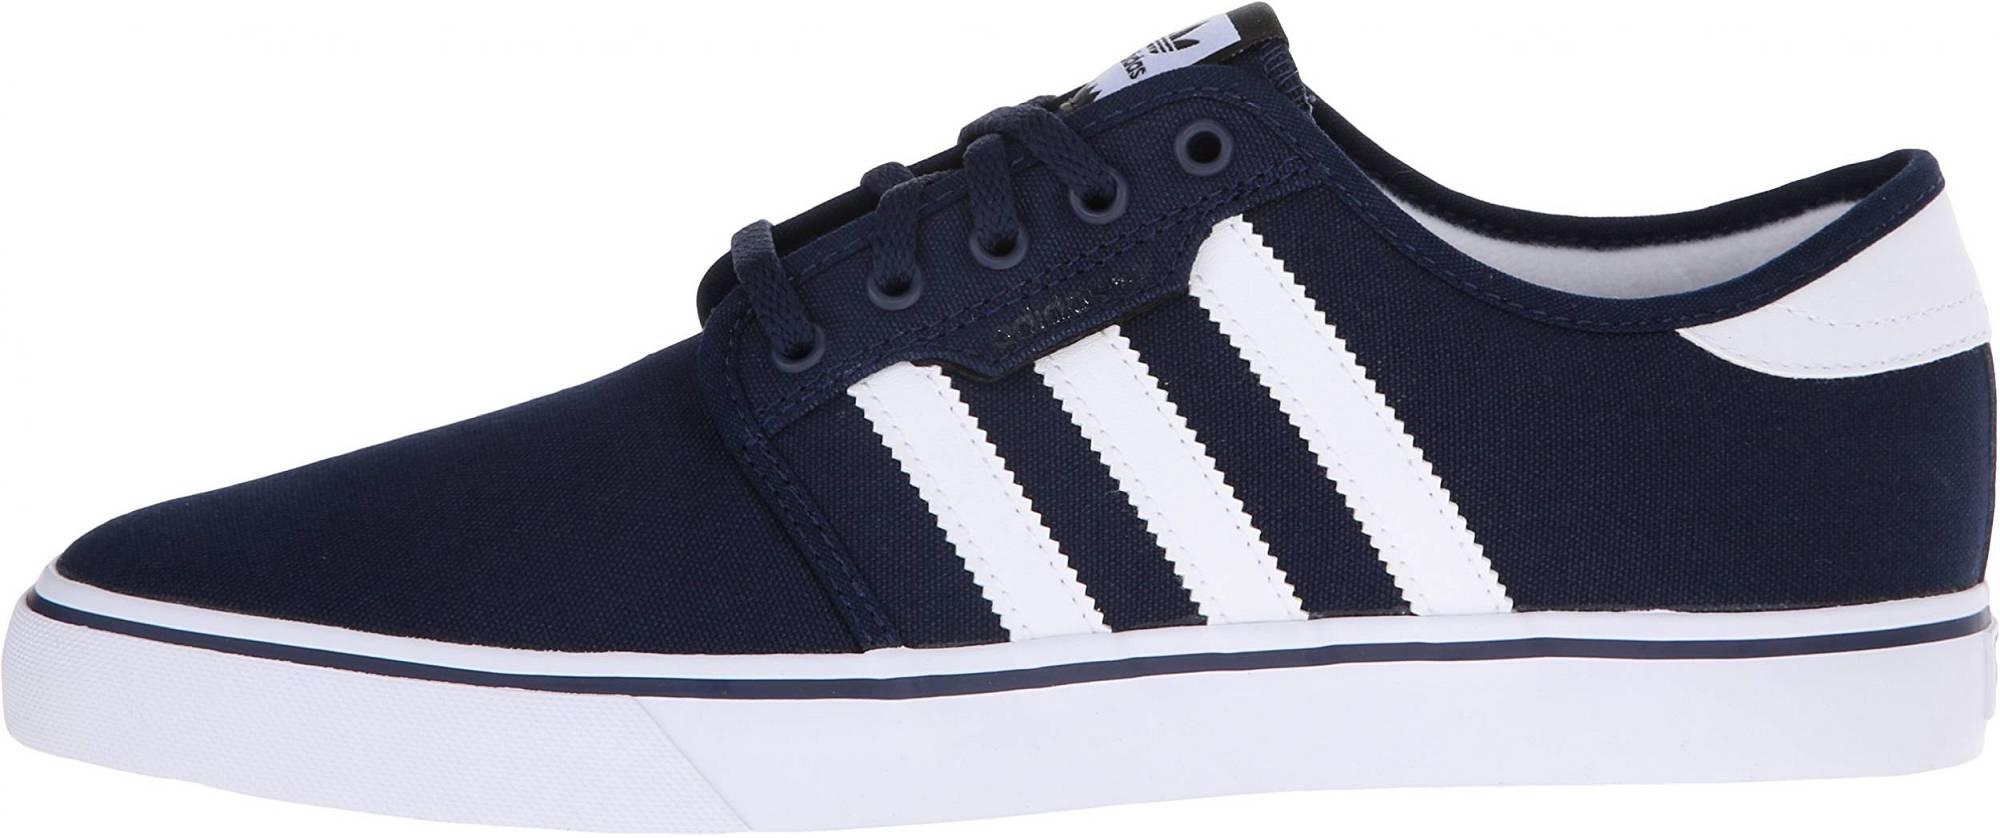 Adidas Seeley – Shoes Reviews \u0026 Reasons